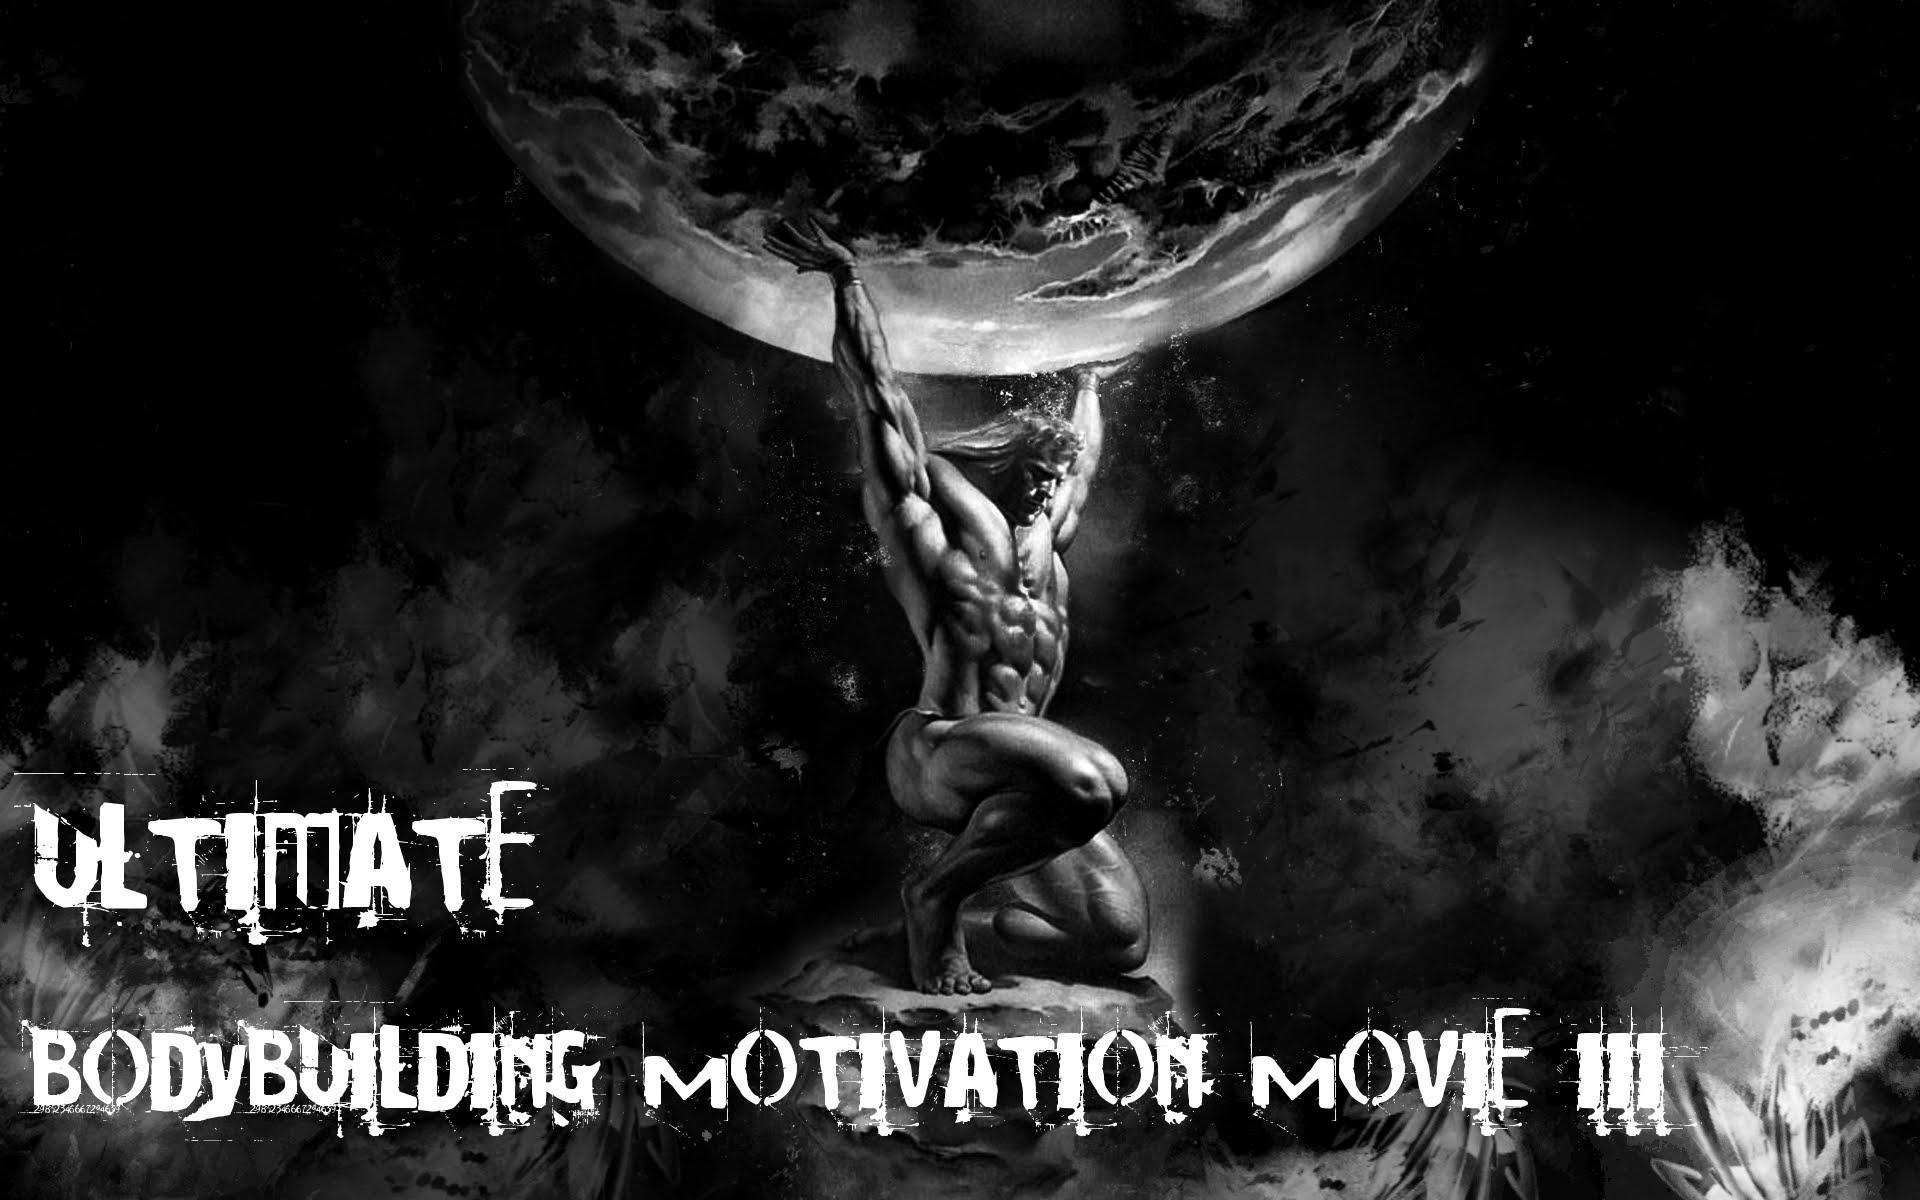 Bodybuilding Motivational Desktop Wallpapers Top Free Bodybuilding Motivational Desktop Backgrounds Wallpaperaccess